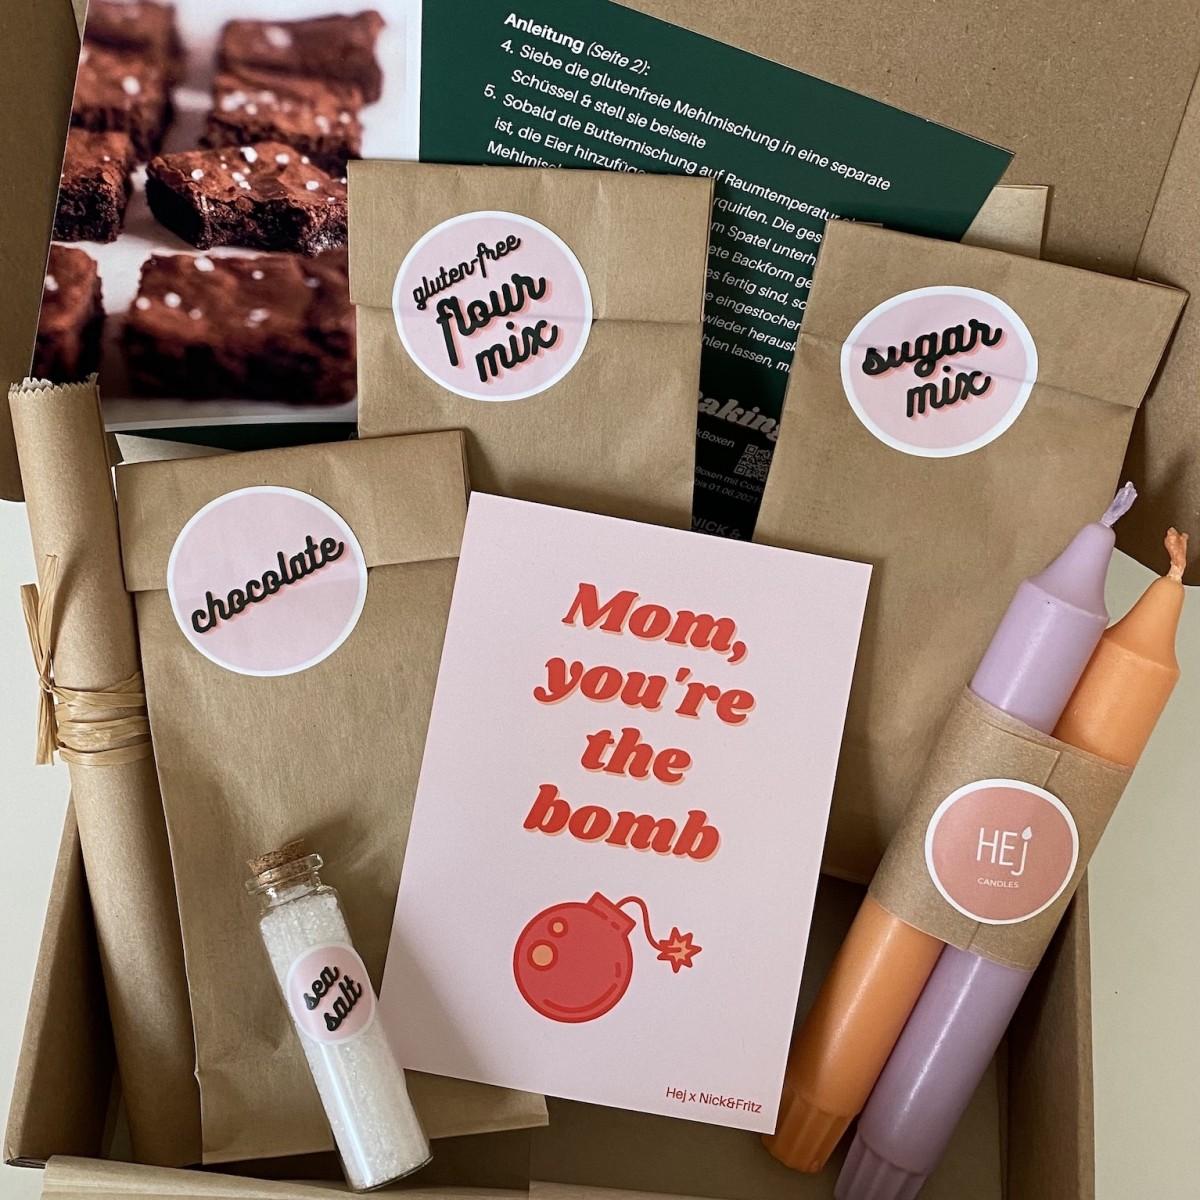 Hej Candles x Muttertags-Backbox  mit Dip Dye Kerzen